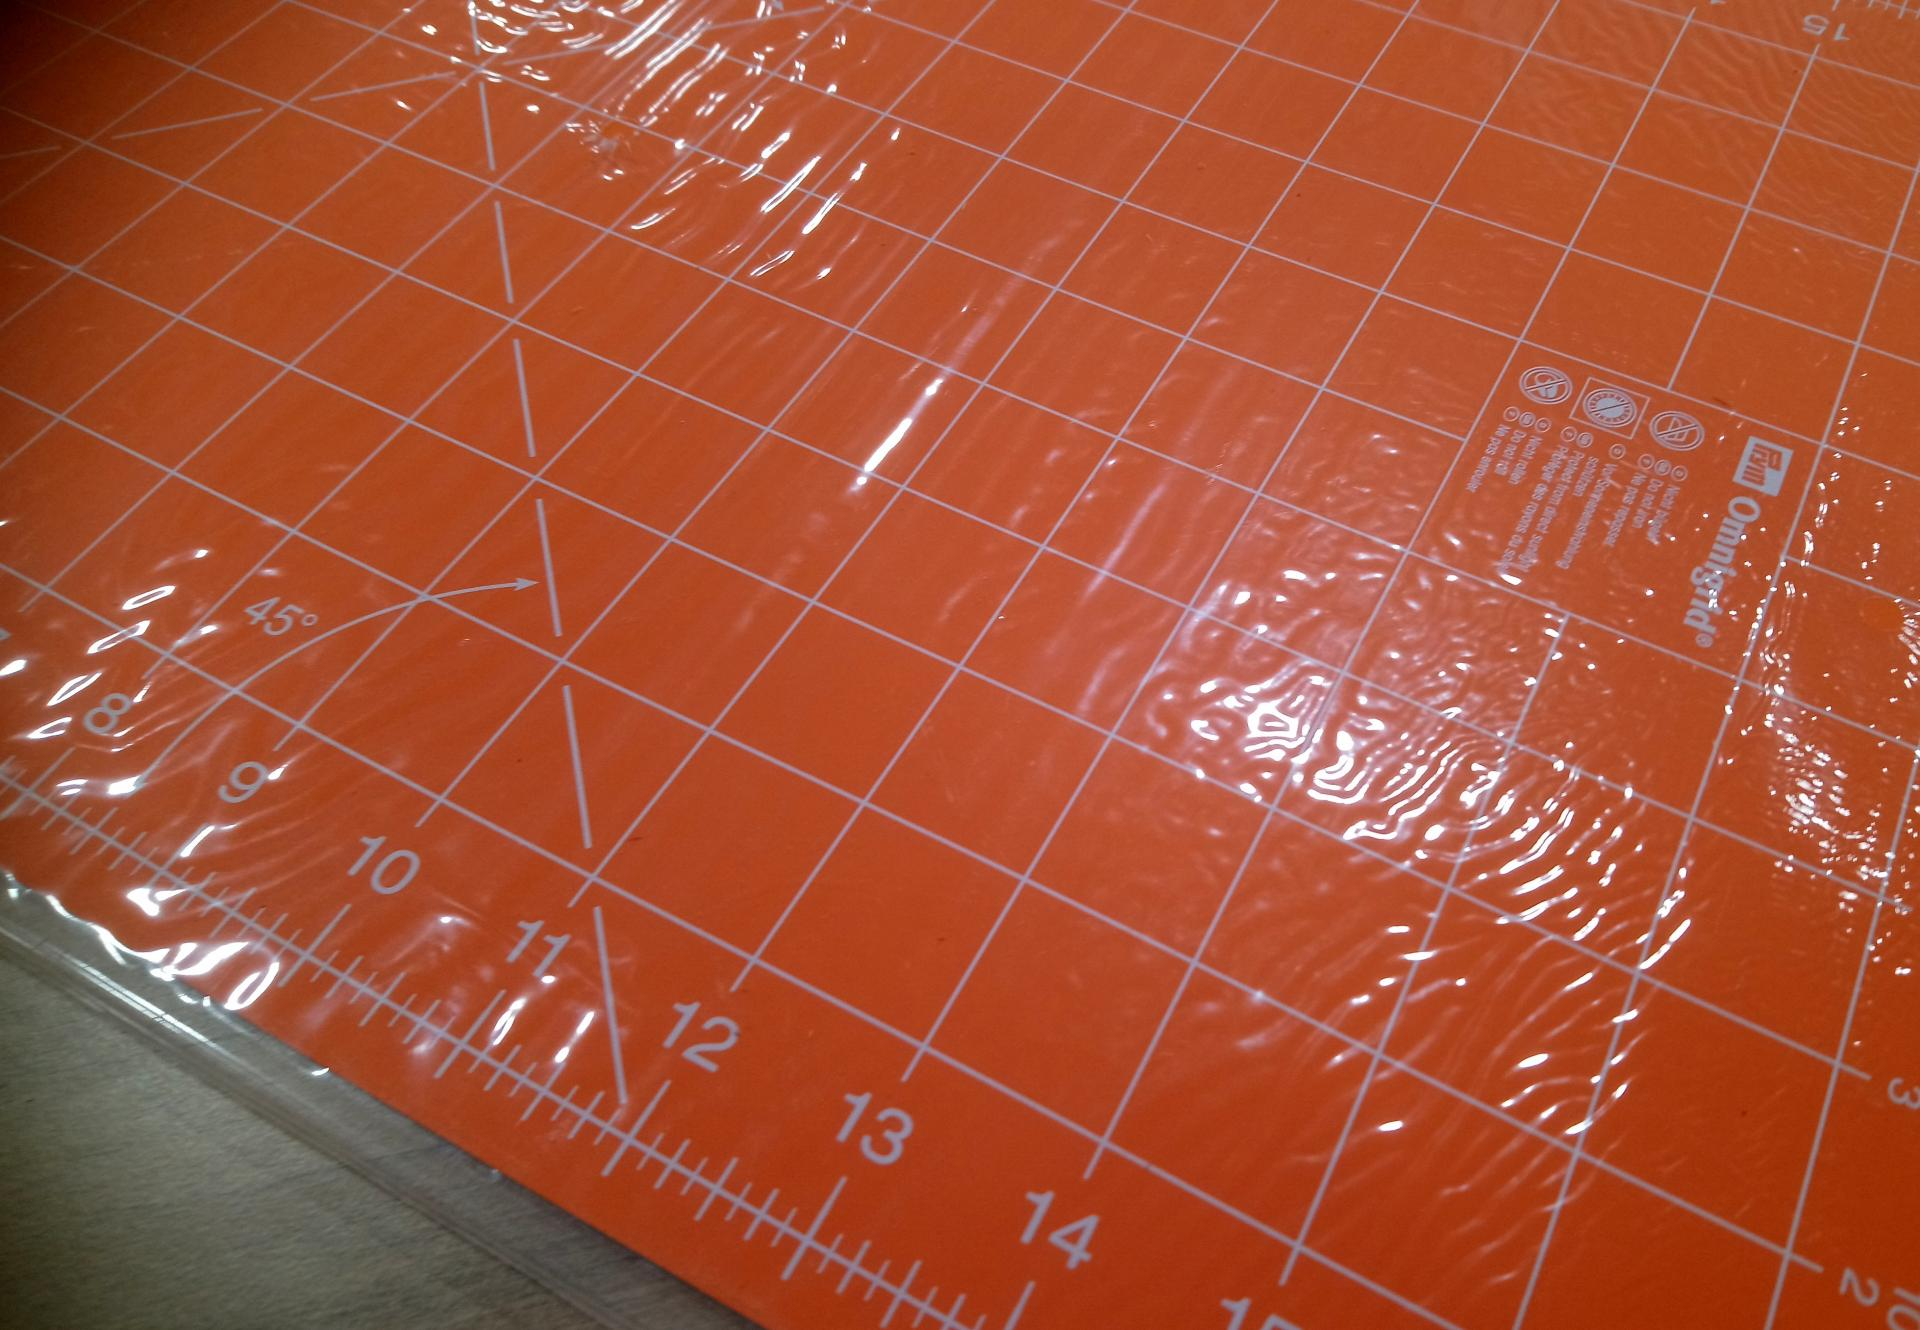 Tapis de decoupe orange 2